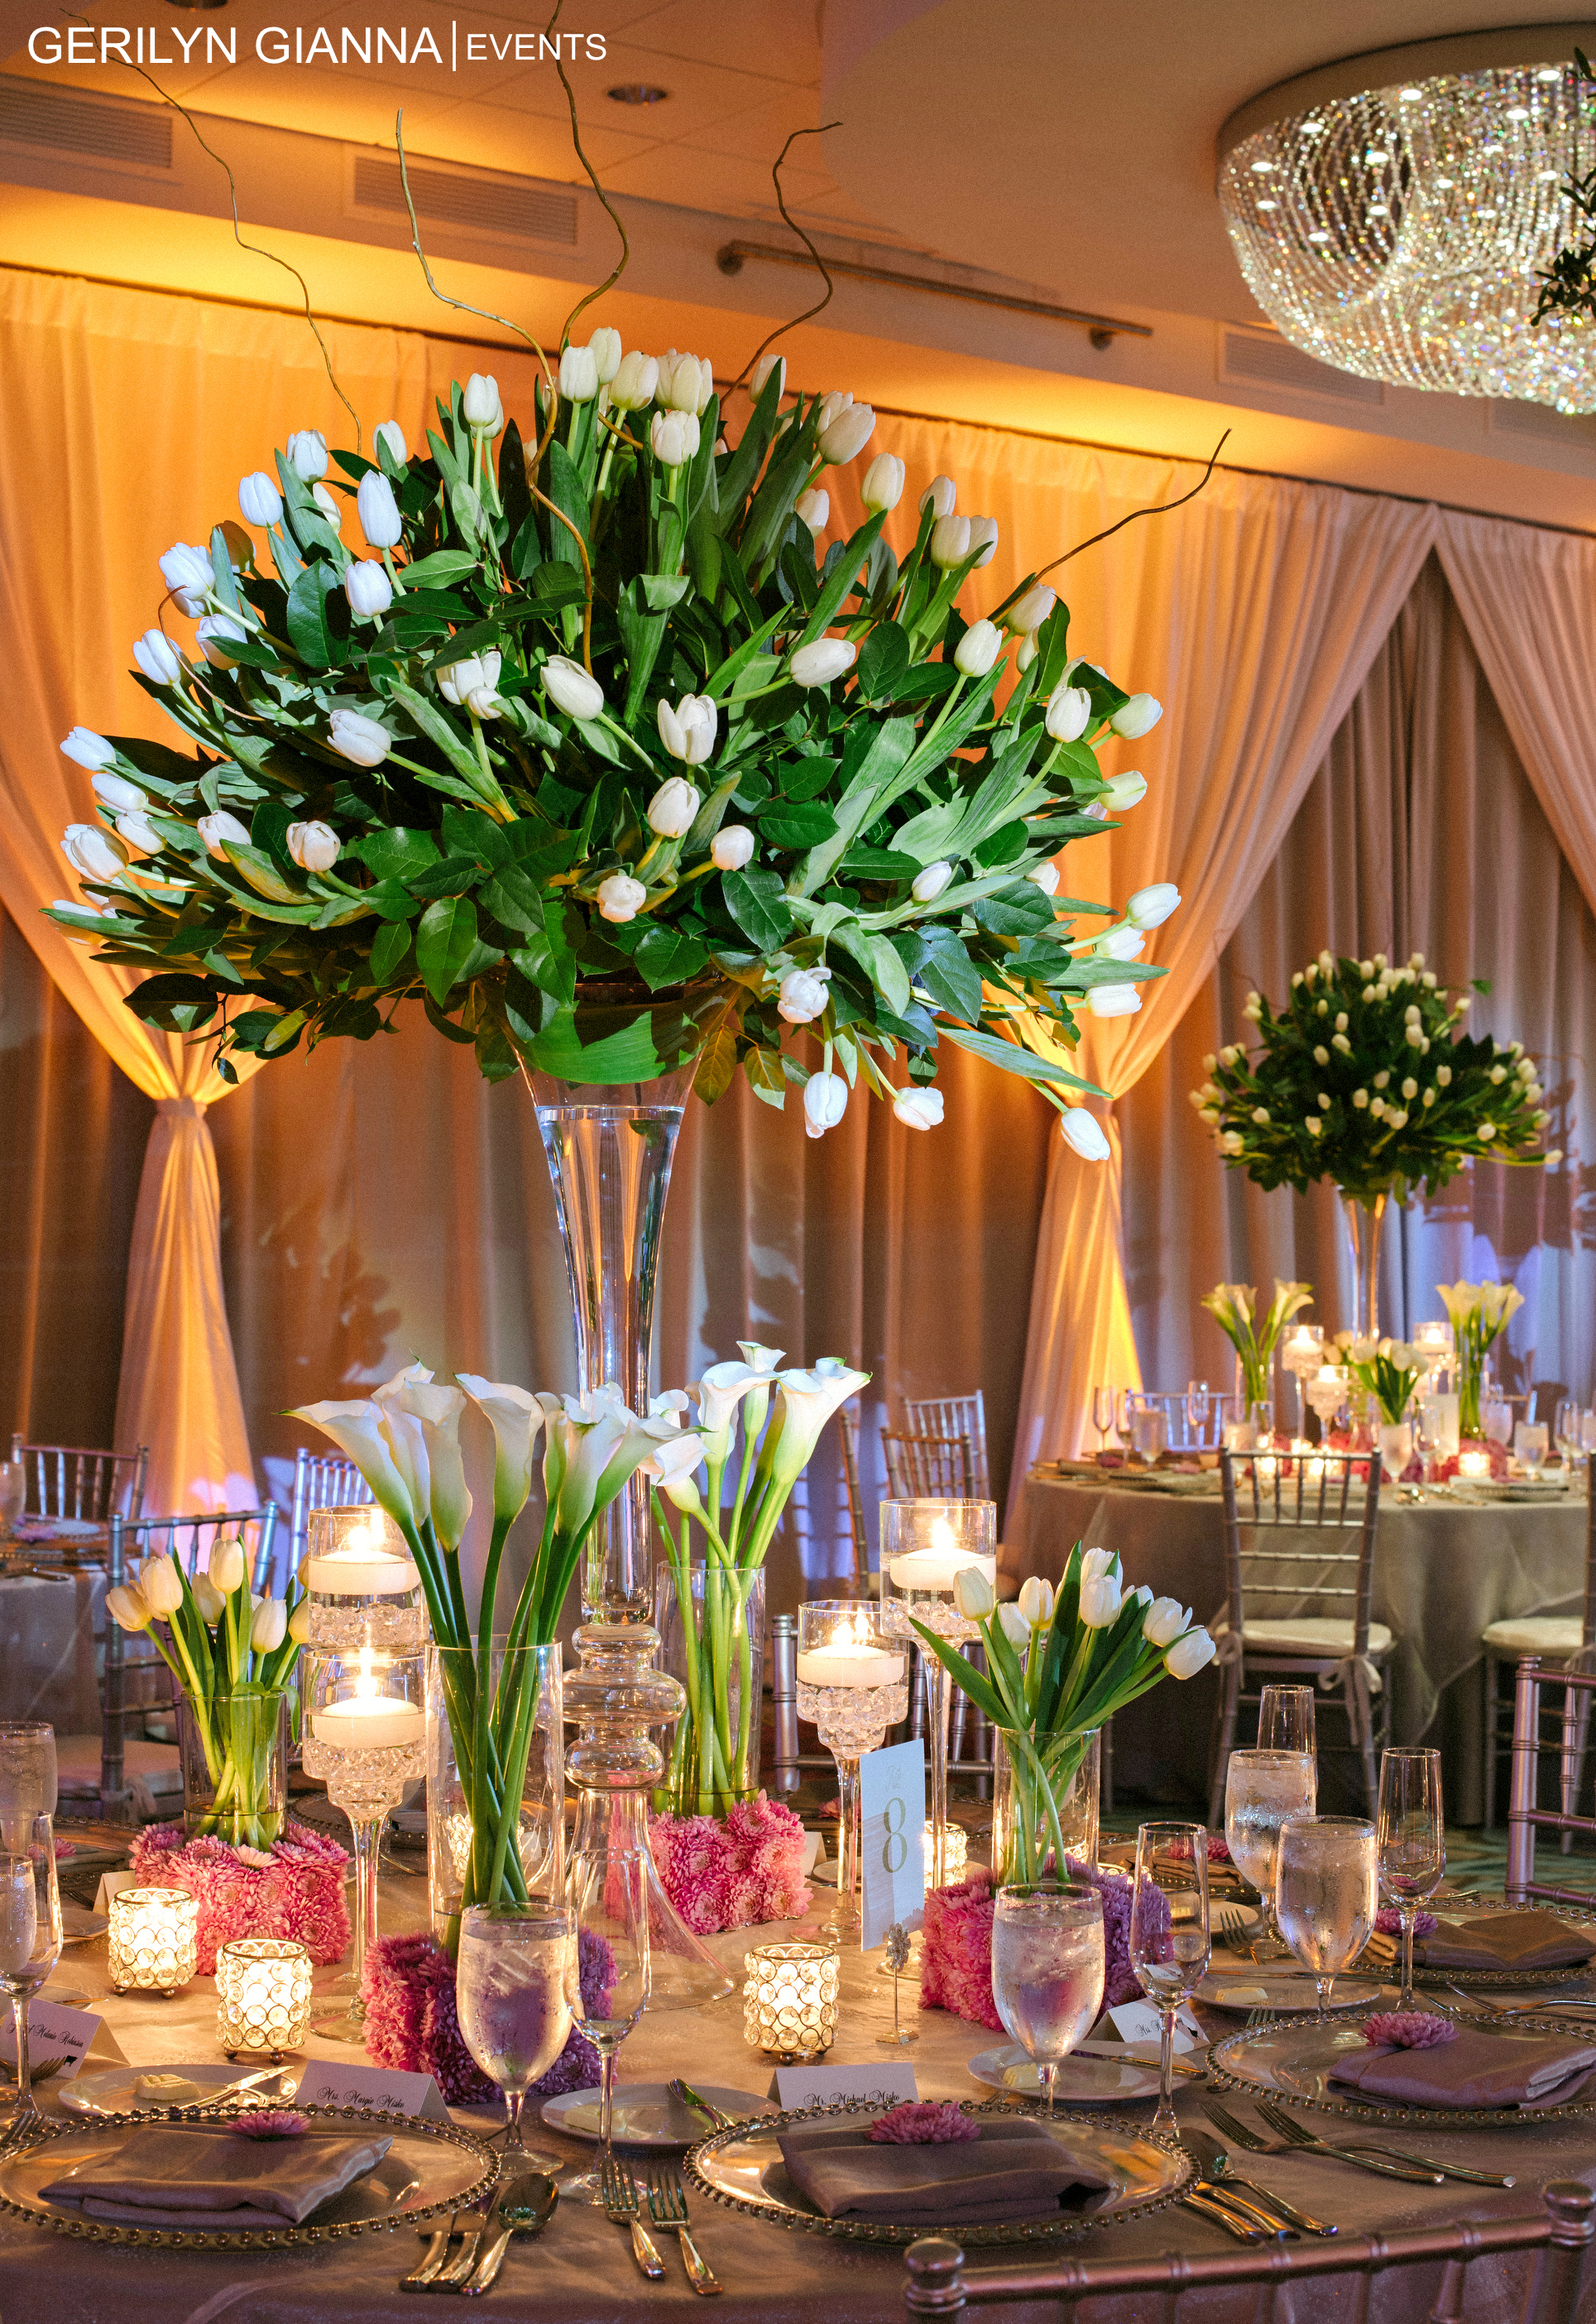 Wyndham Grand Jupiter Wedding | Gerilyn Gianna Event and Floral Design | Palm Beach Wedding